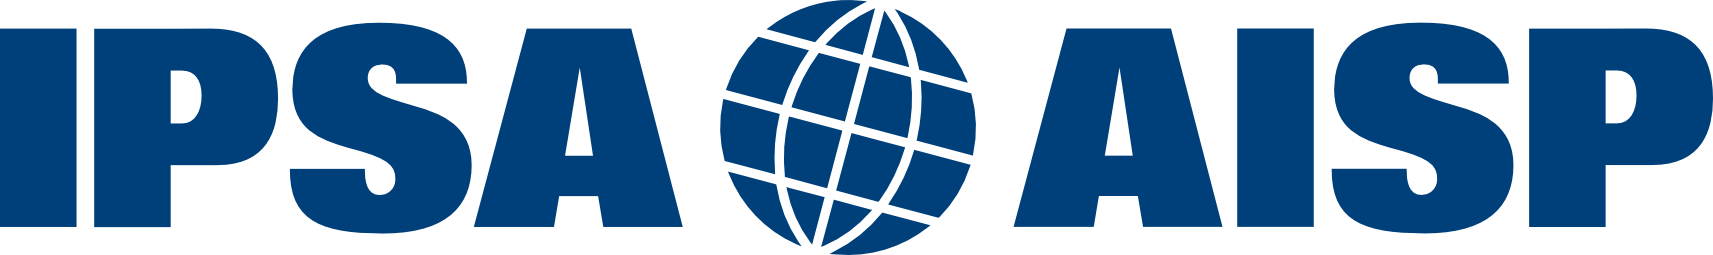 logo for International Political Science Association